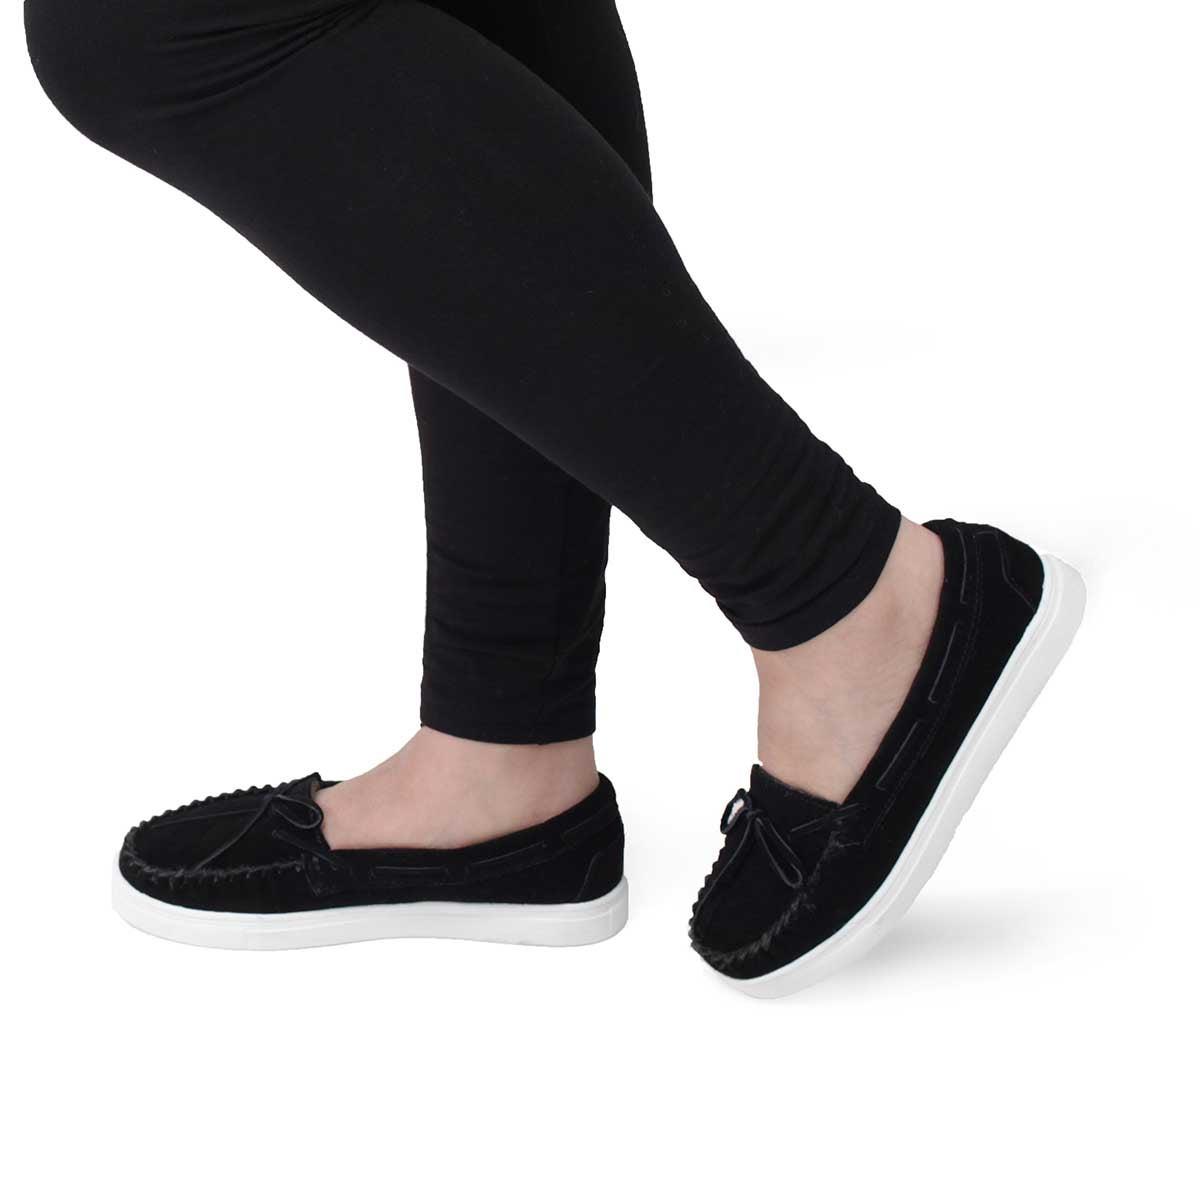 Lds Saginaw black ballerina moc